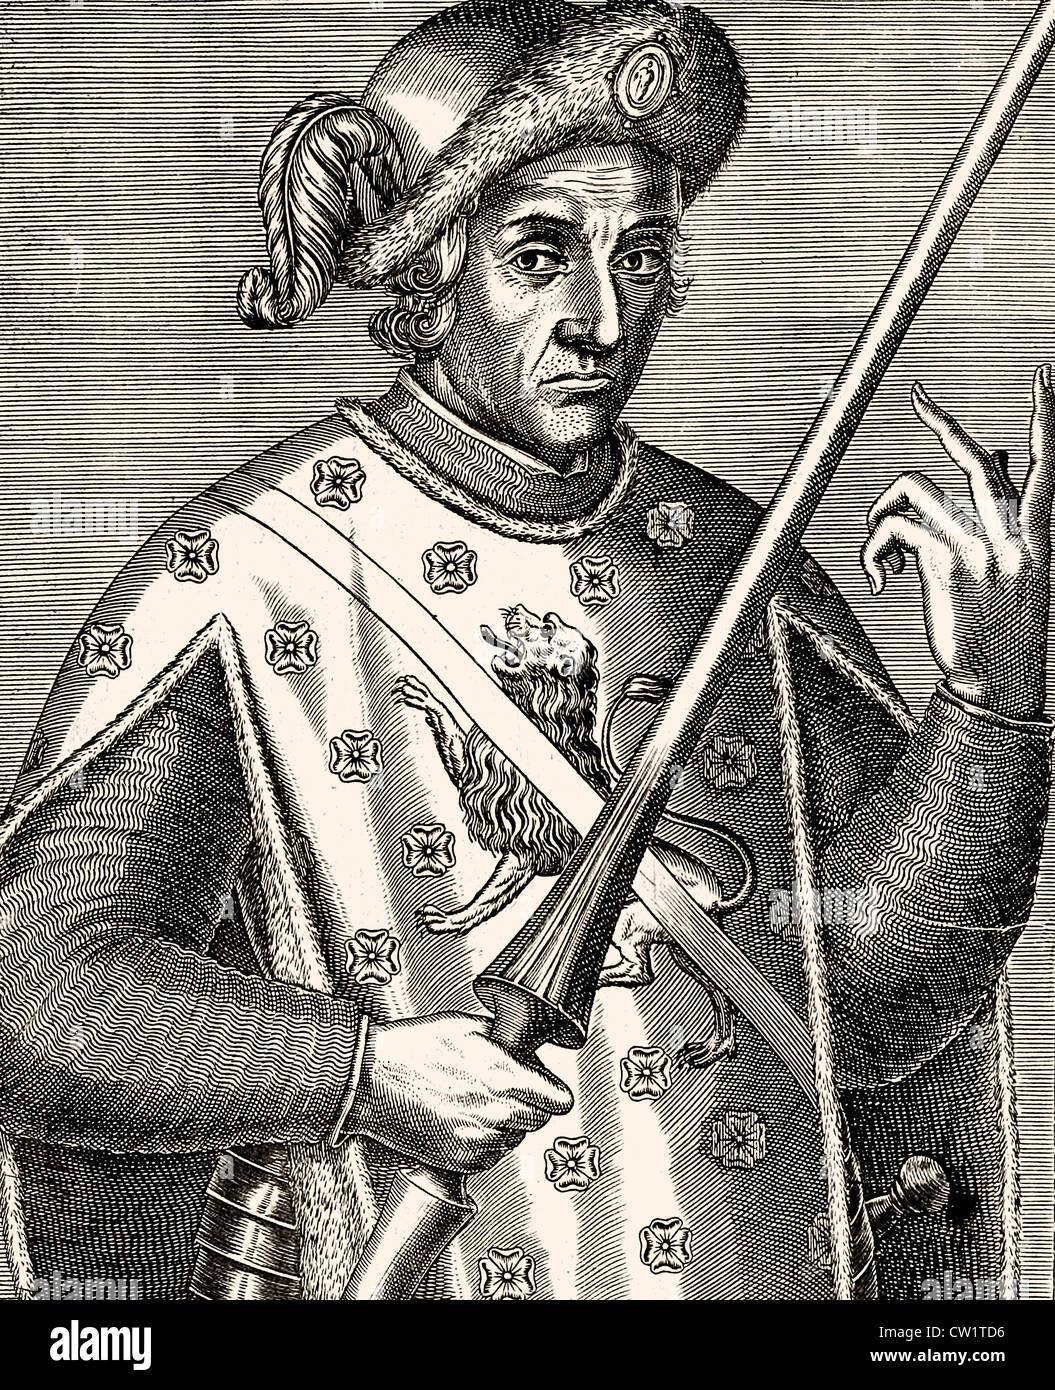 Edward Prince of Wales - Stock Image